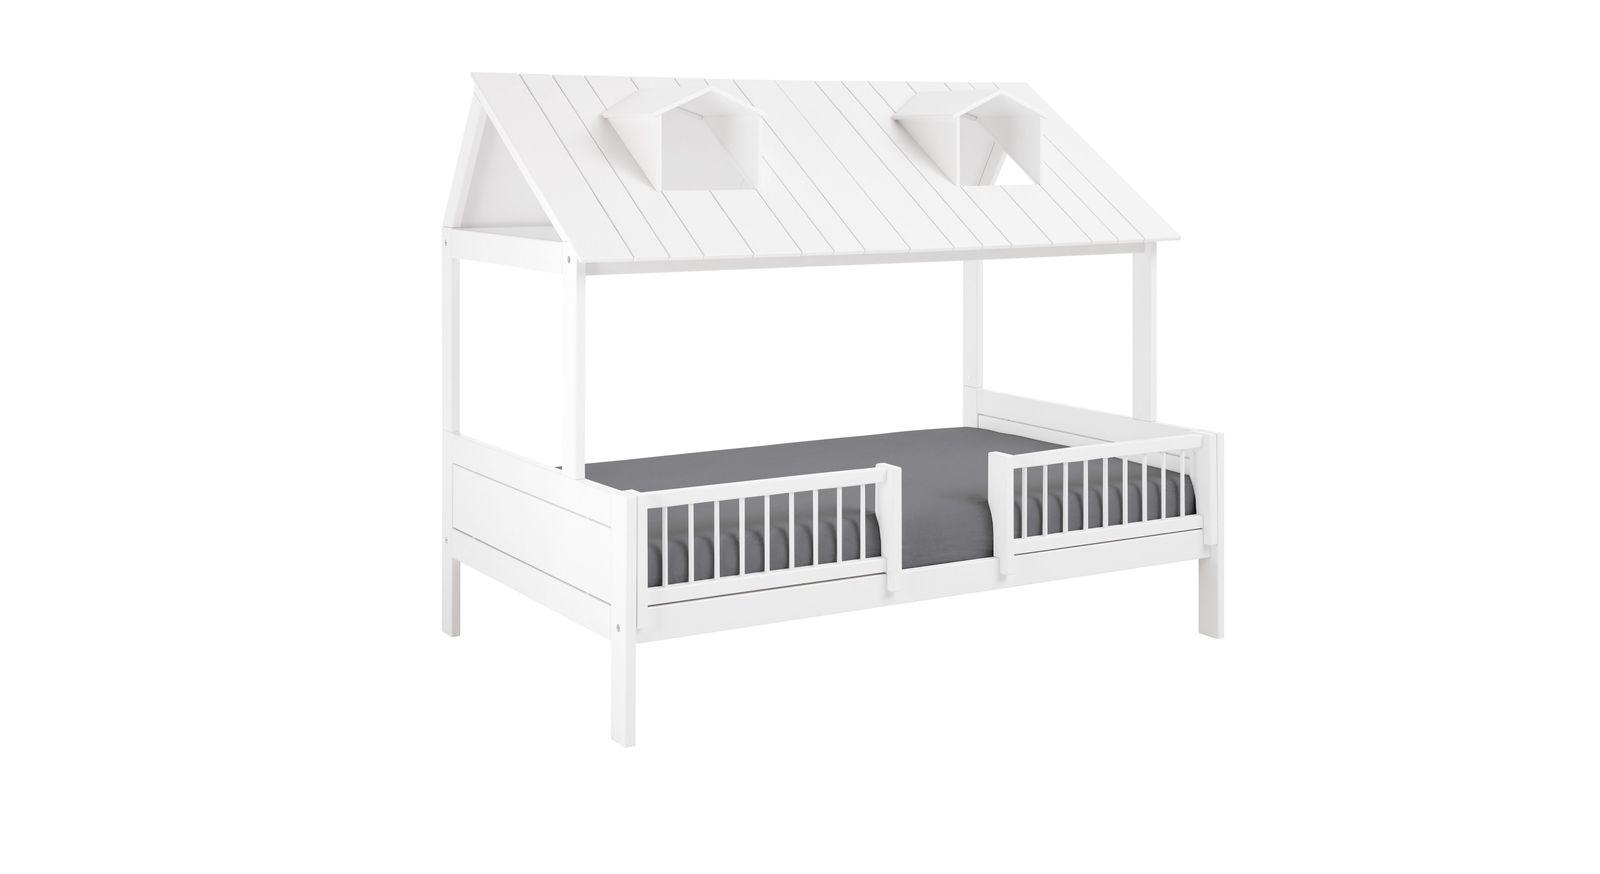 LIFETIME Kinderbett Ferienhaus 120x200 cm